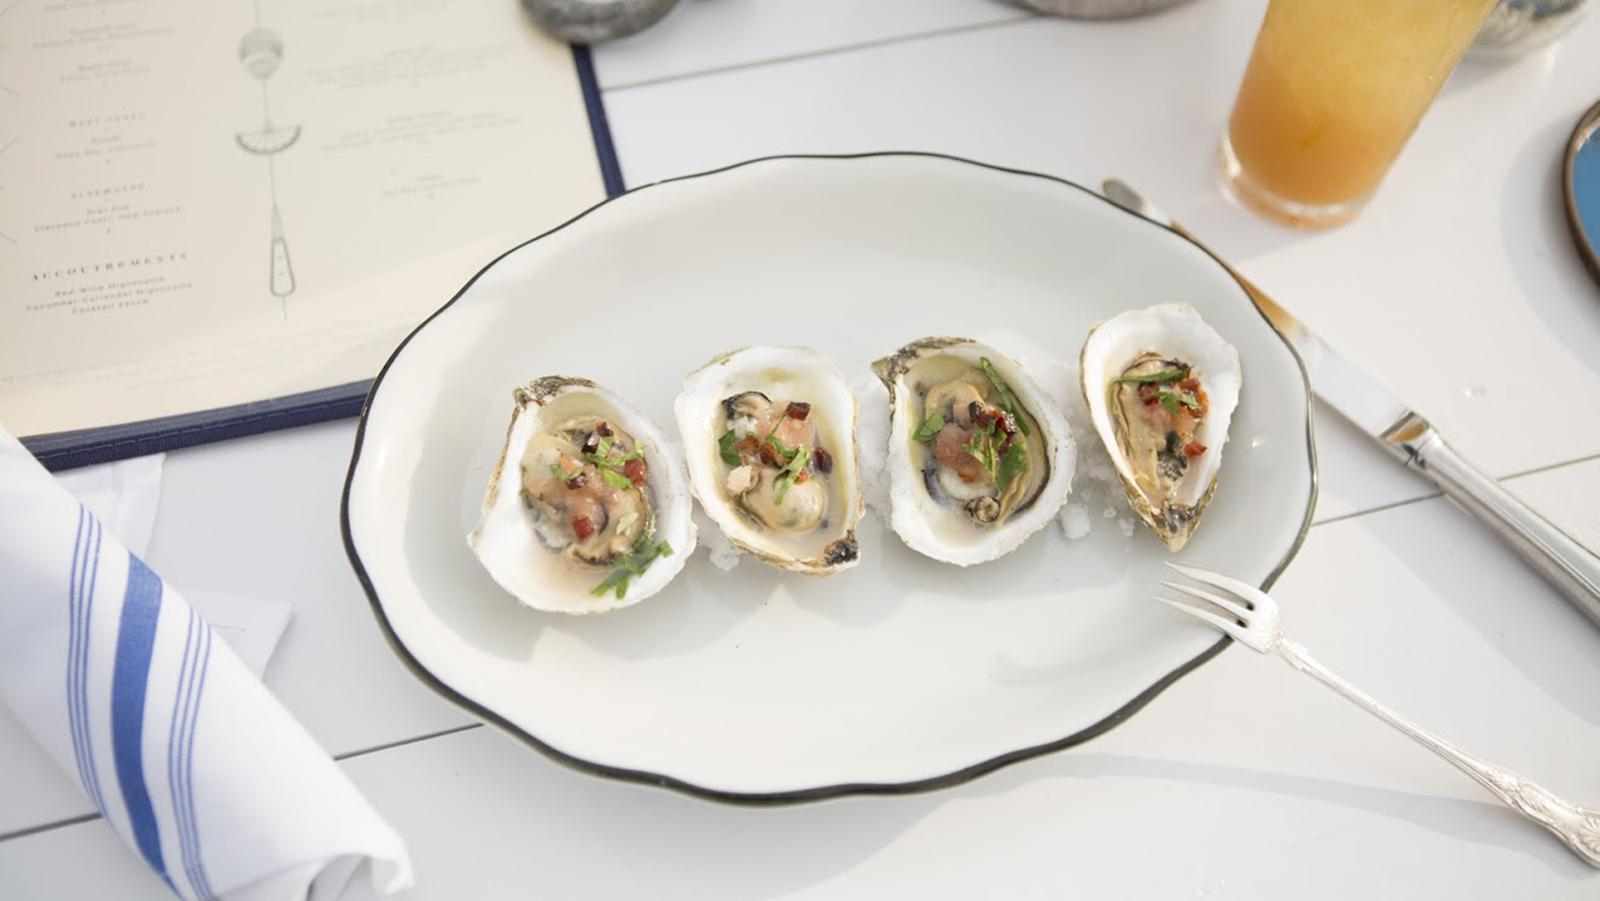 Worlds Best Waterfront Restaurants 26 Places Youre Sure